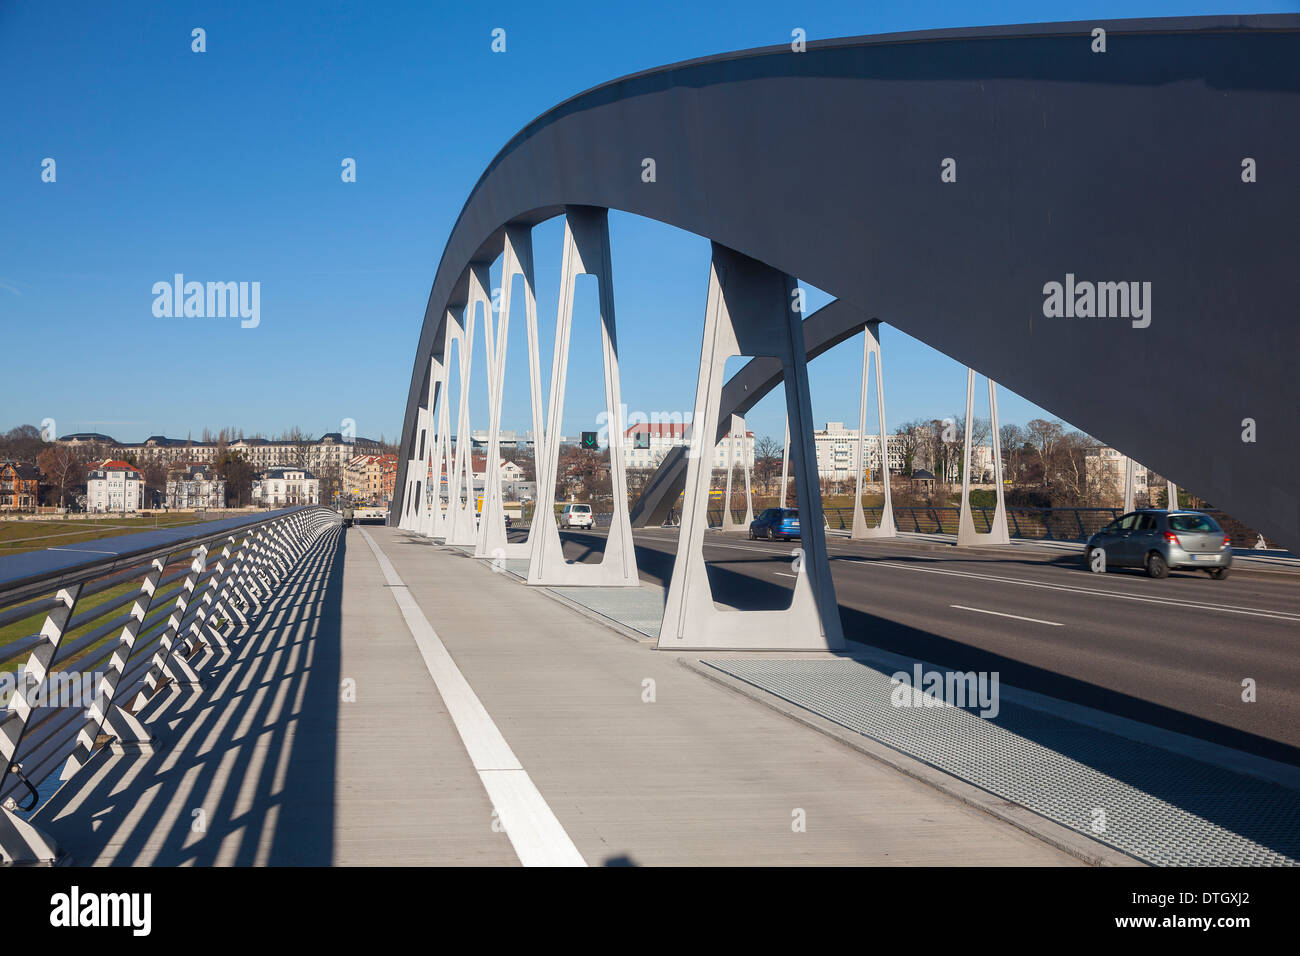 Waldschlösschen Bridge, Dresden, Saxony, Germany - Stock Image